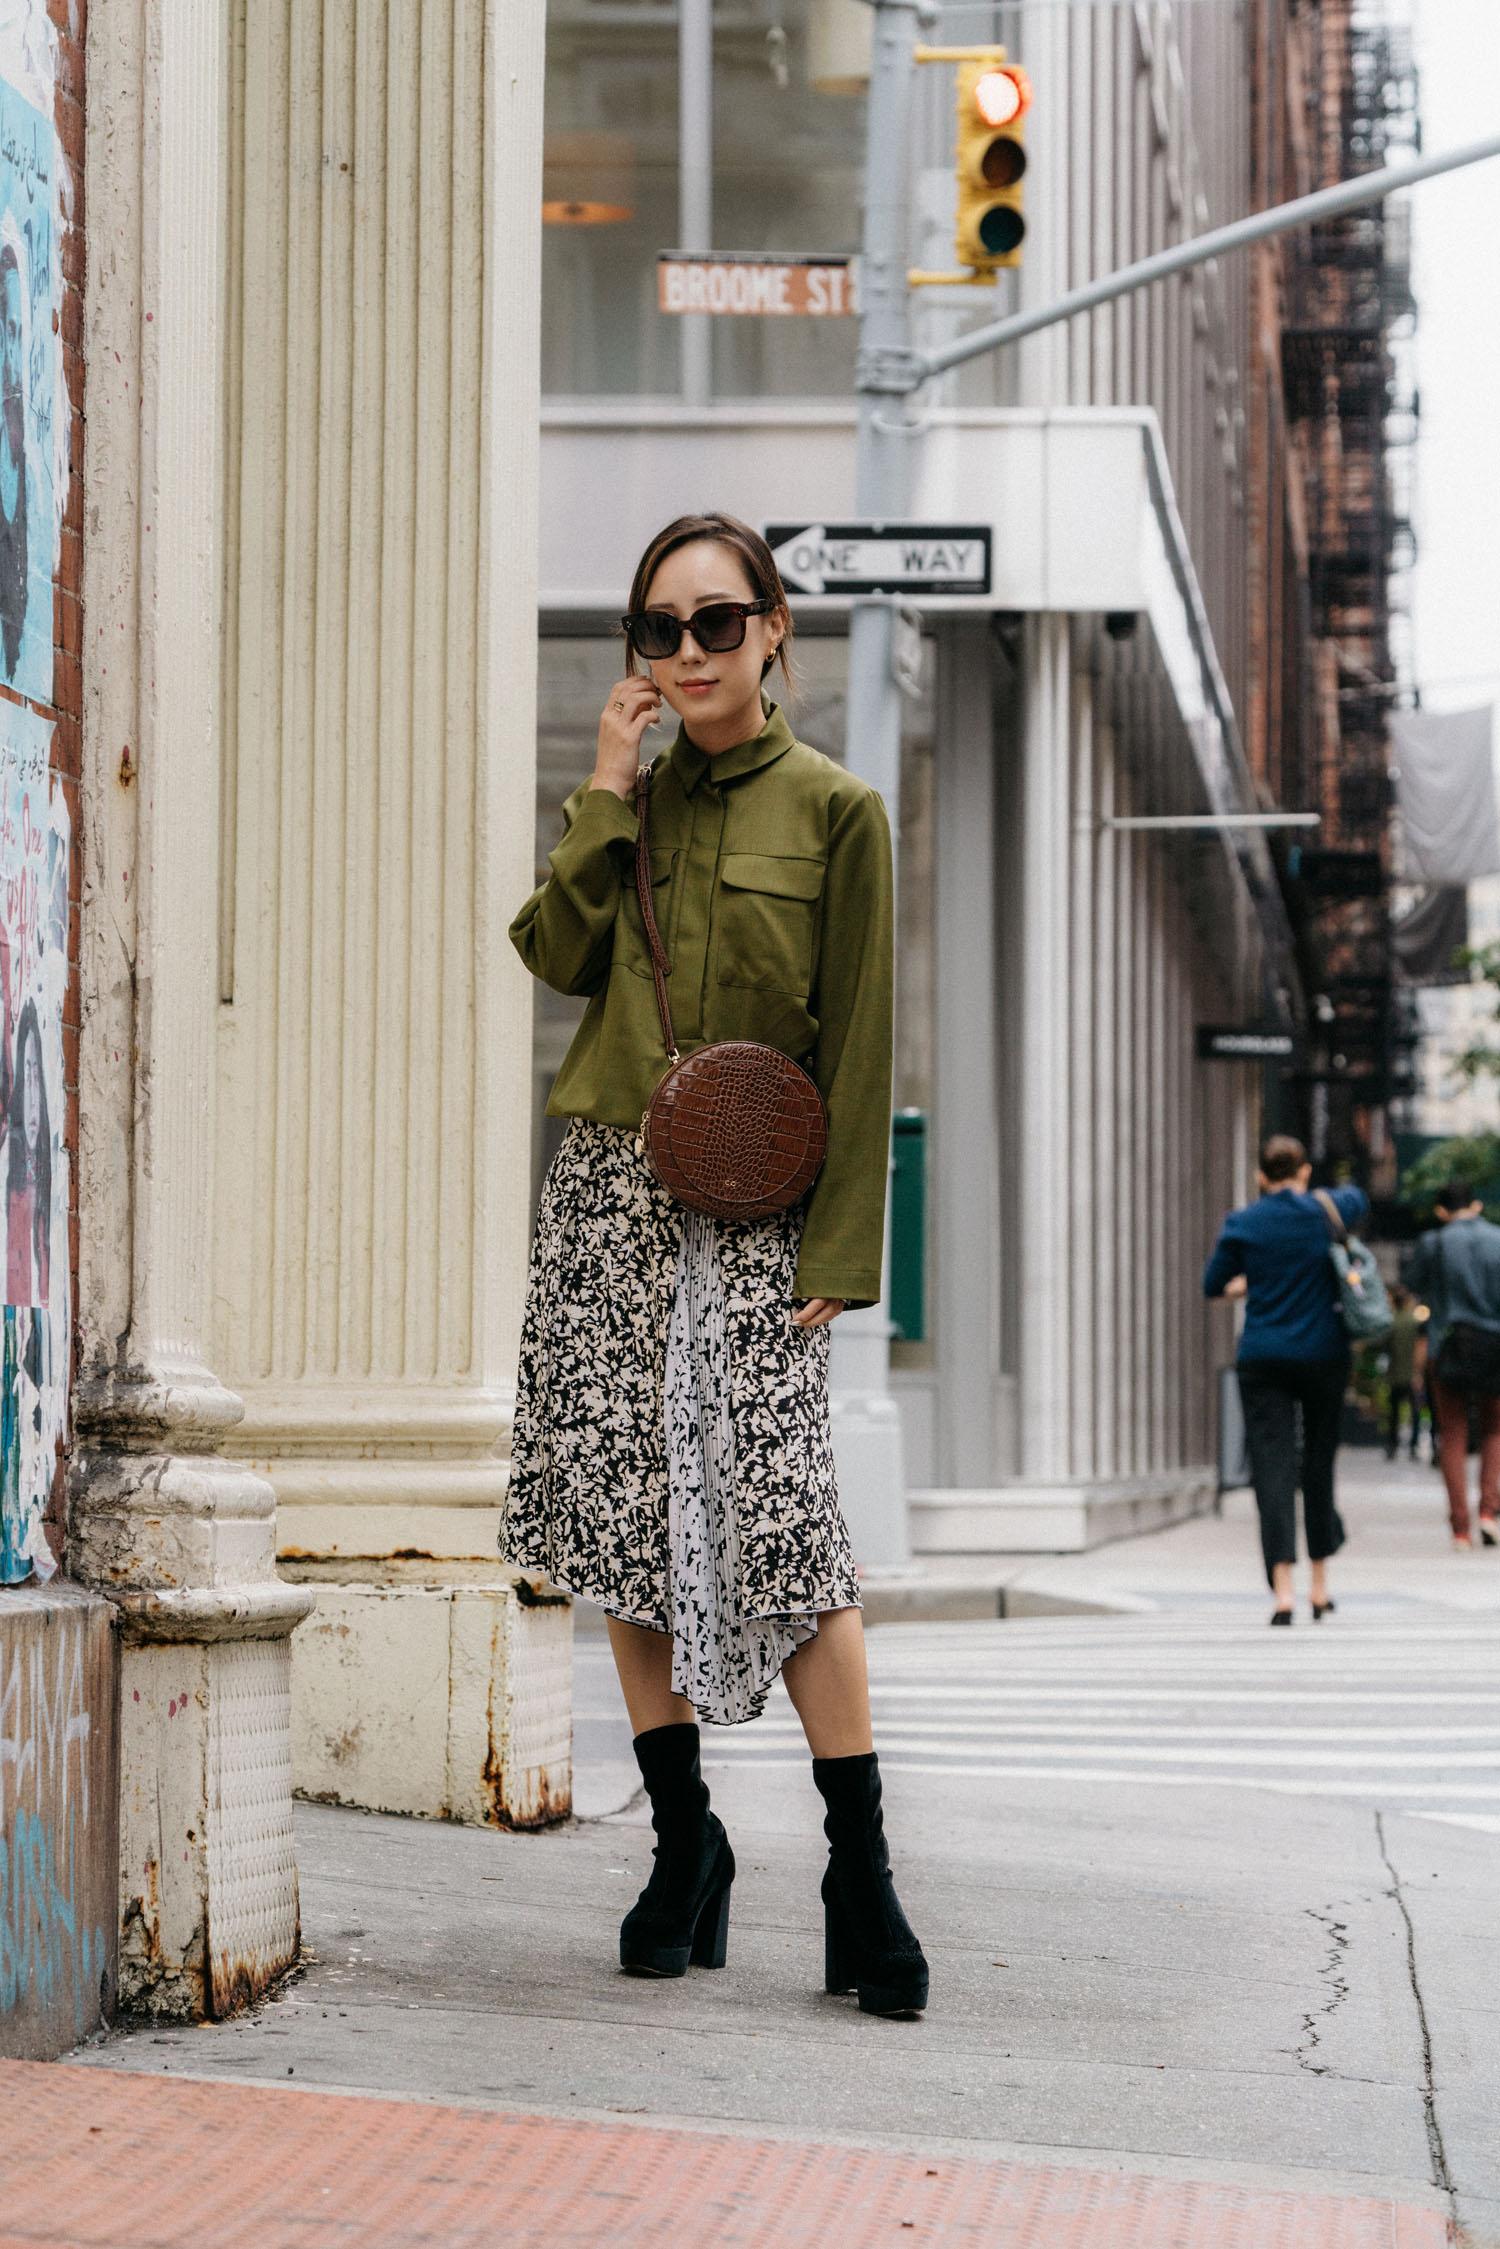 Norse Projects Top, Proenza Schouler Skirt, Miu Miu Boots, CO Collection Bag, Céline Sunglasses